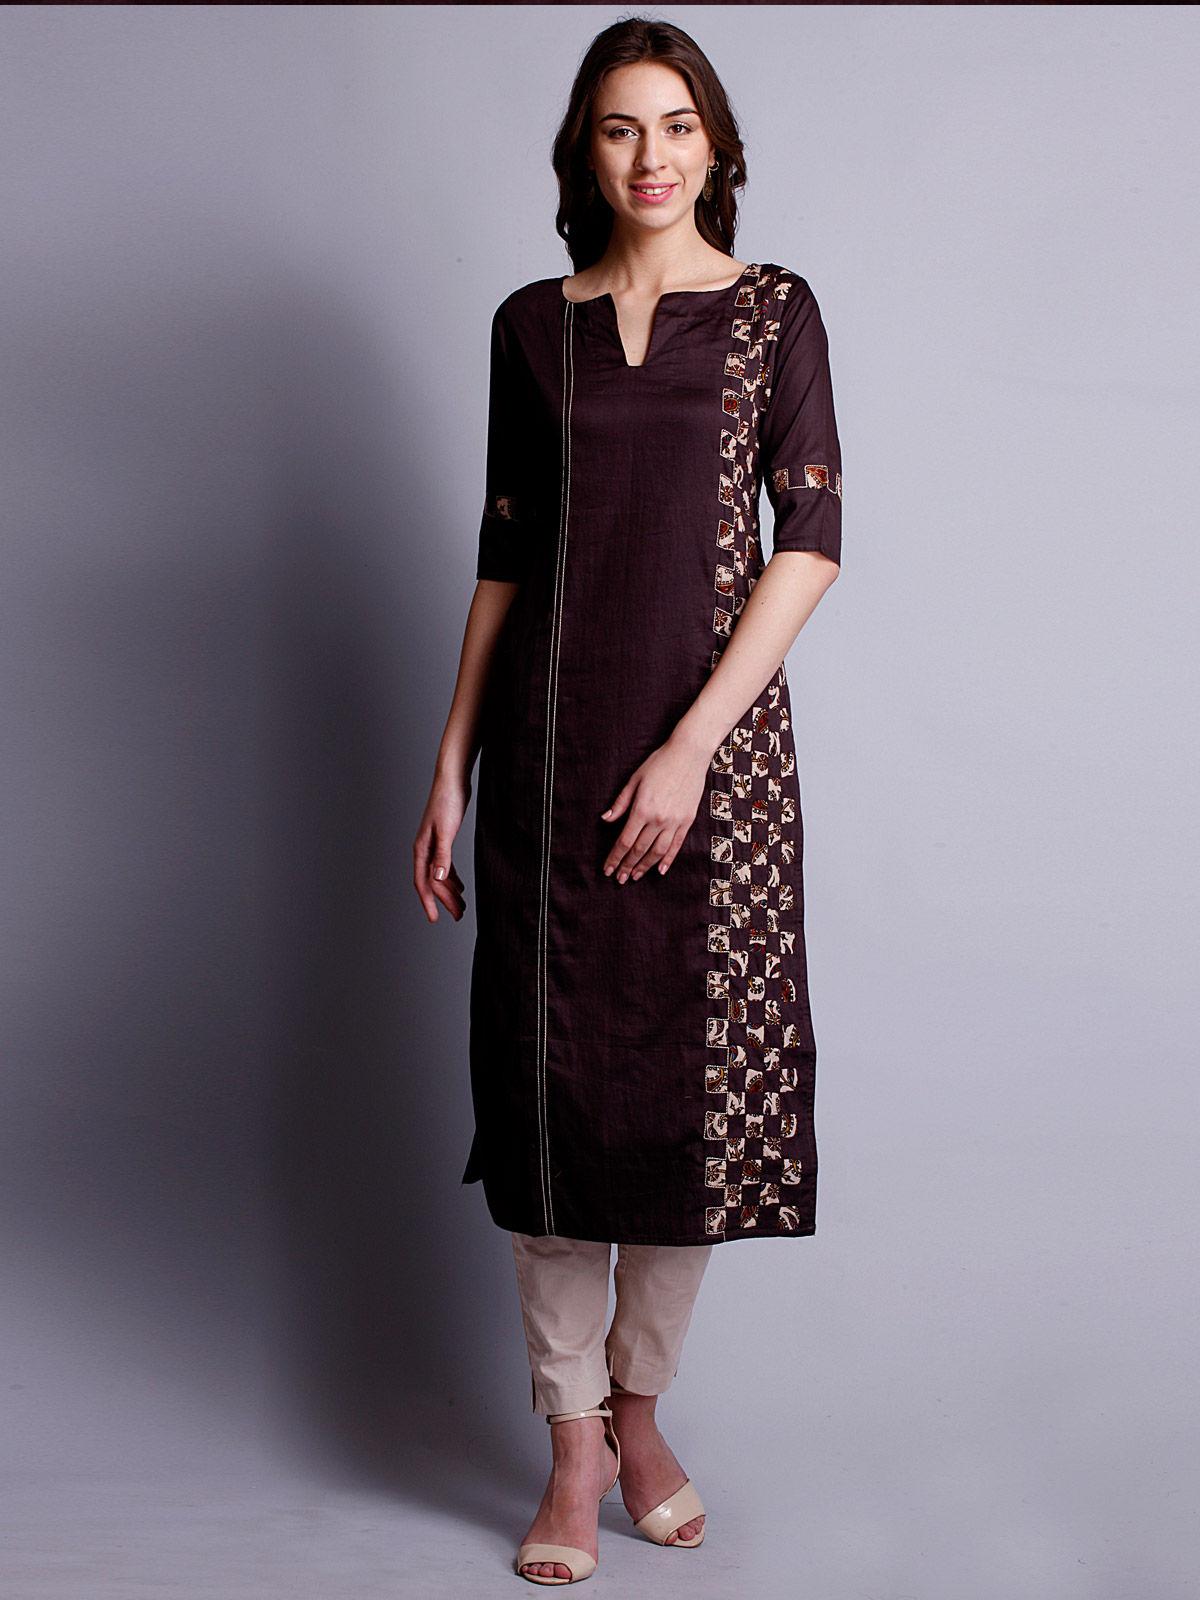 Rasin color reverse applique cotton satin kurta with side panel detailing.